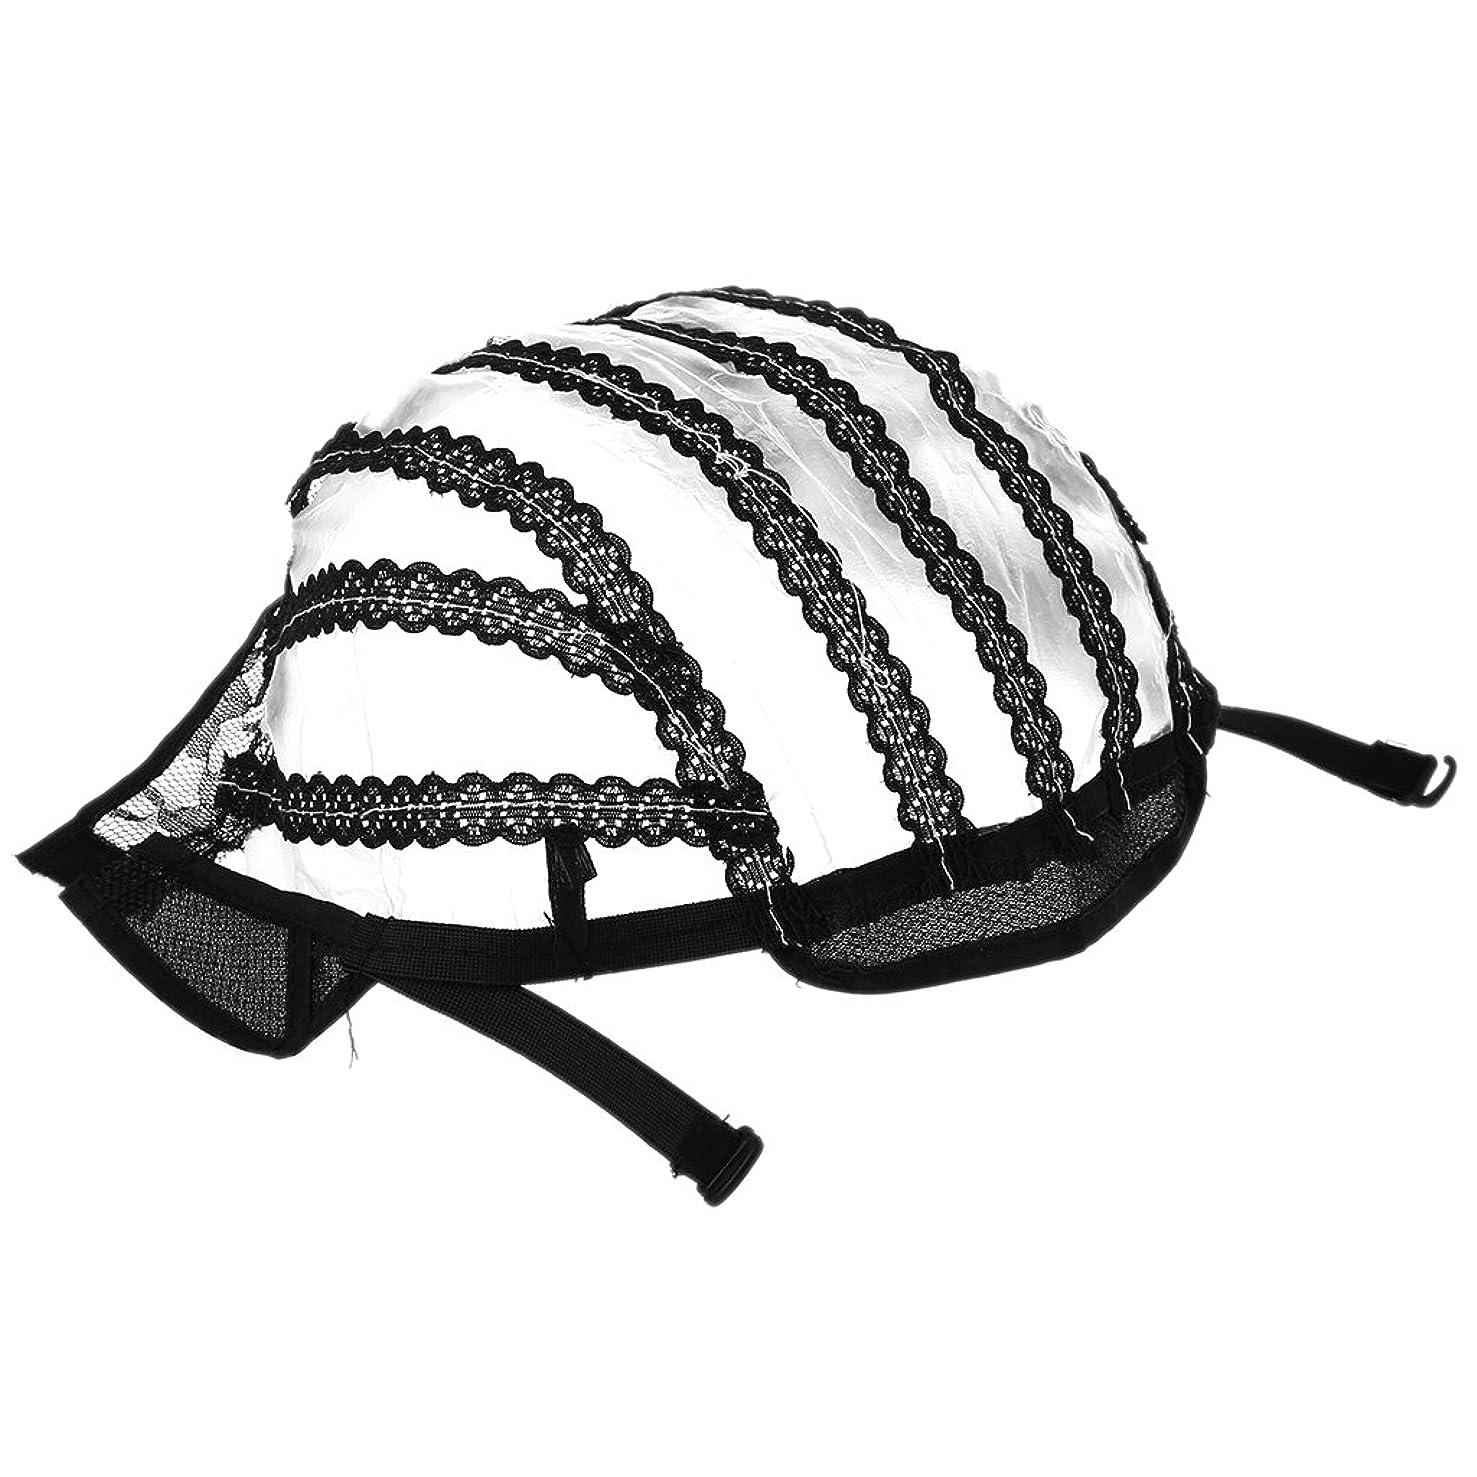 YOUSIKE Wig Cap For Men Women, U-part Shape Wig Cap, Glueless Lace Front Net Weaving Mesh Adjustable Strap Elastic